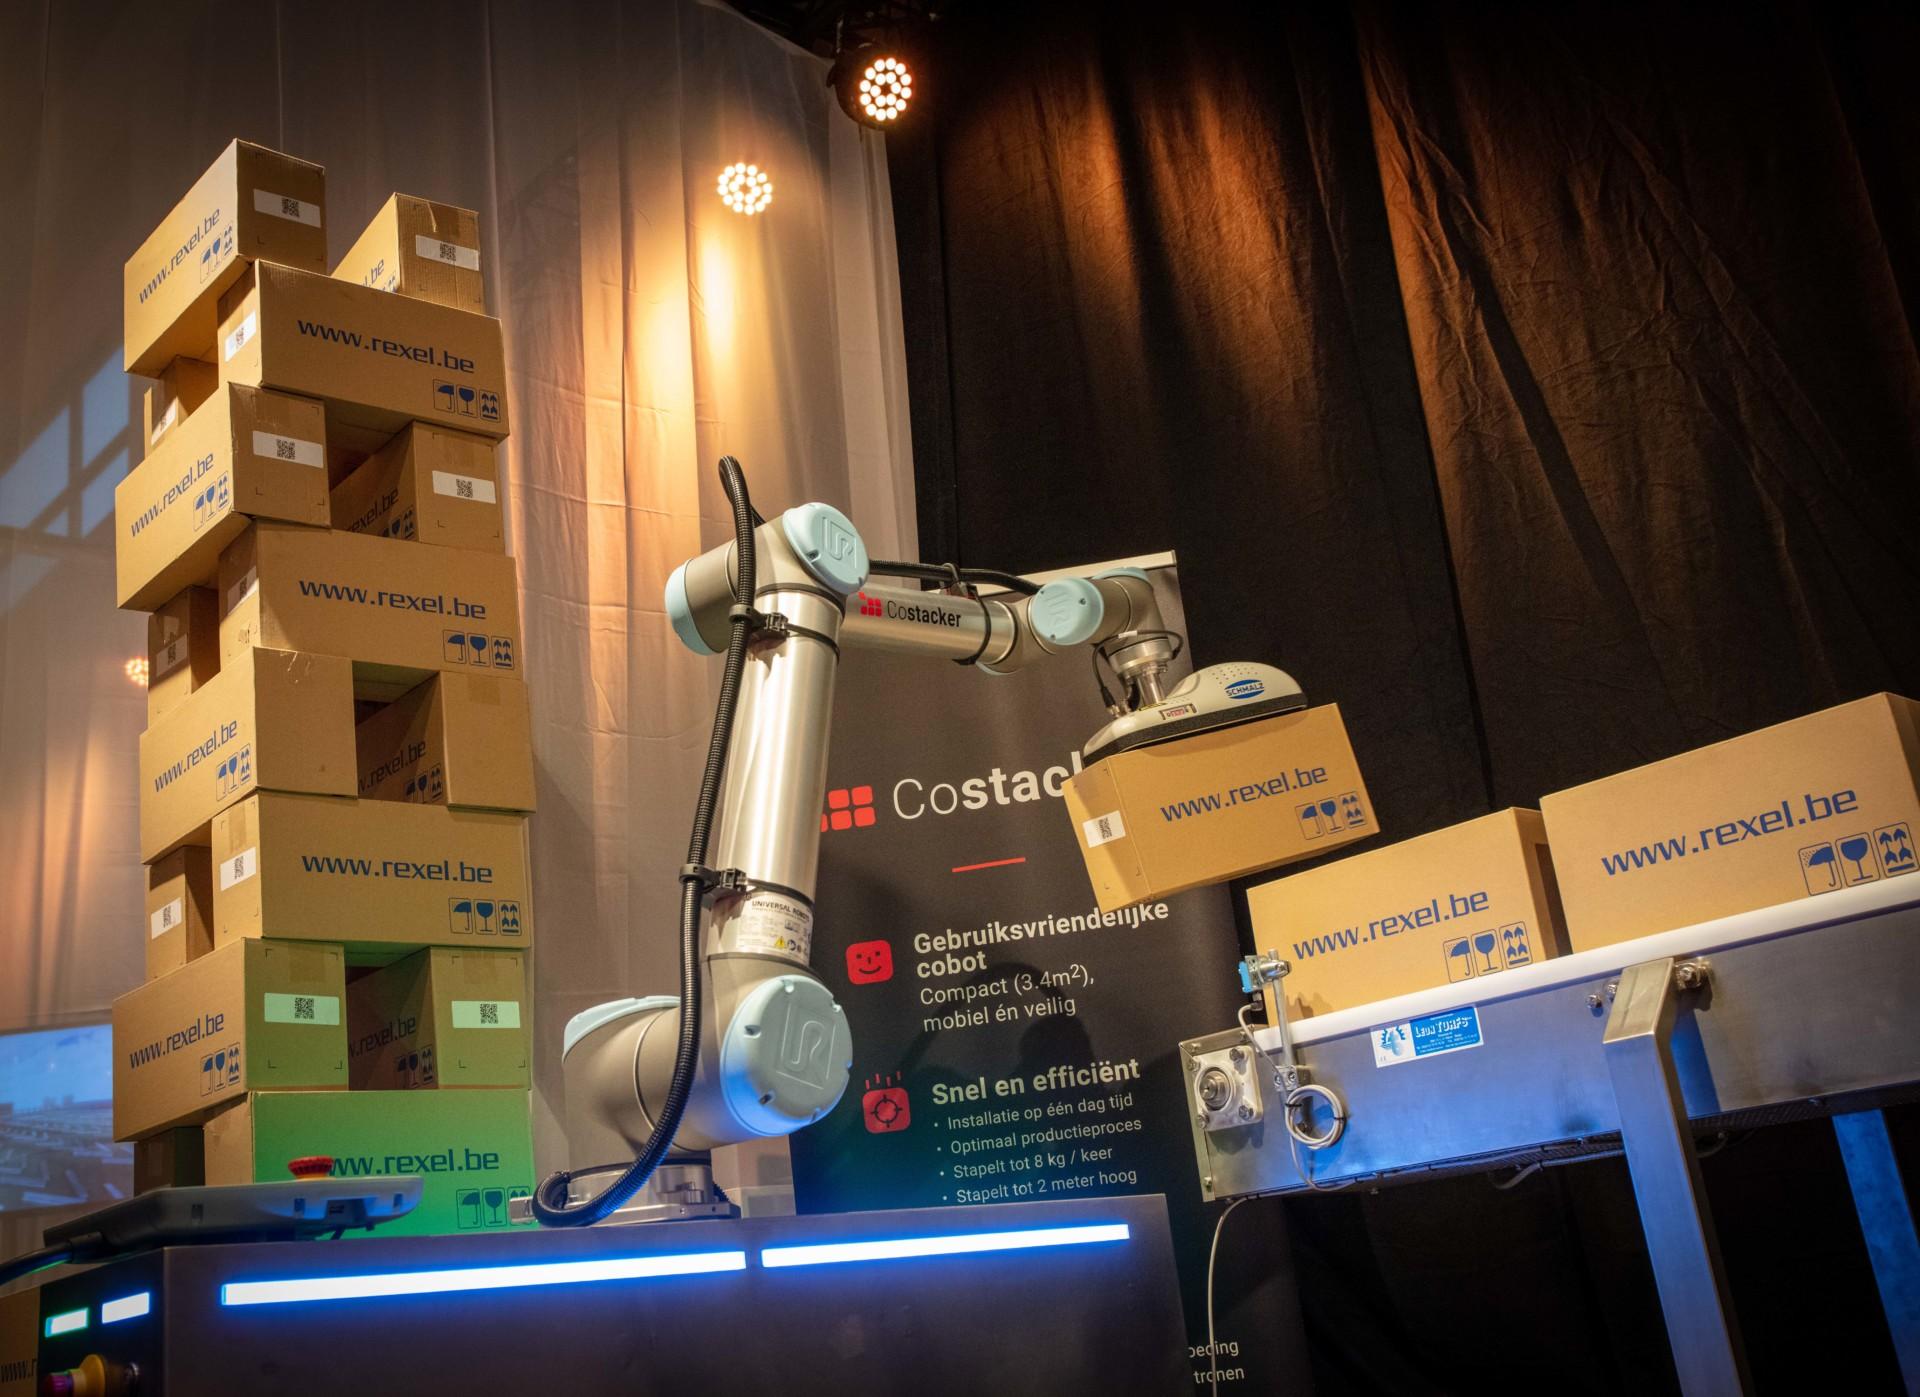 Costacker: Compact palletizer